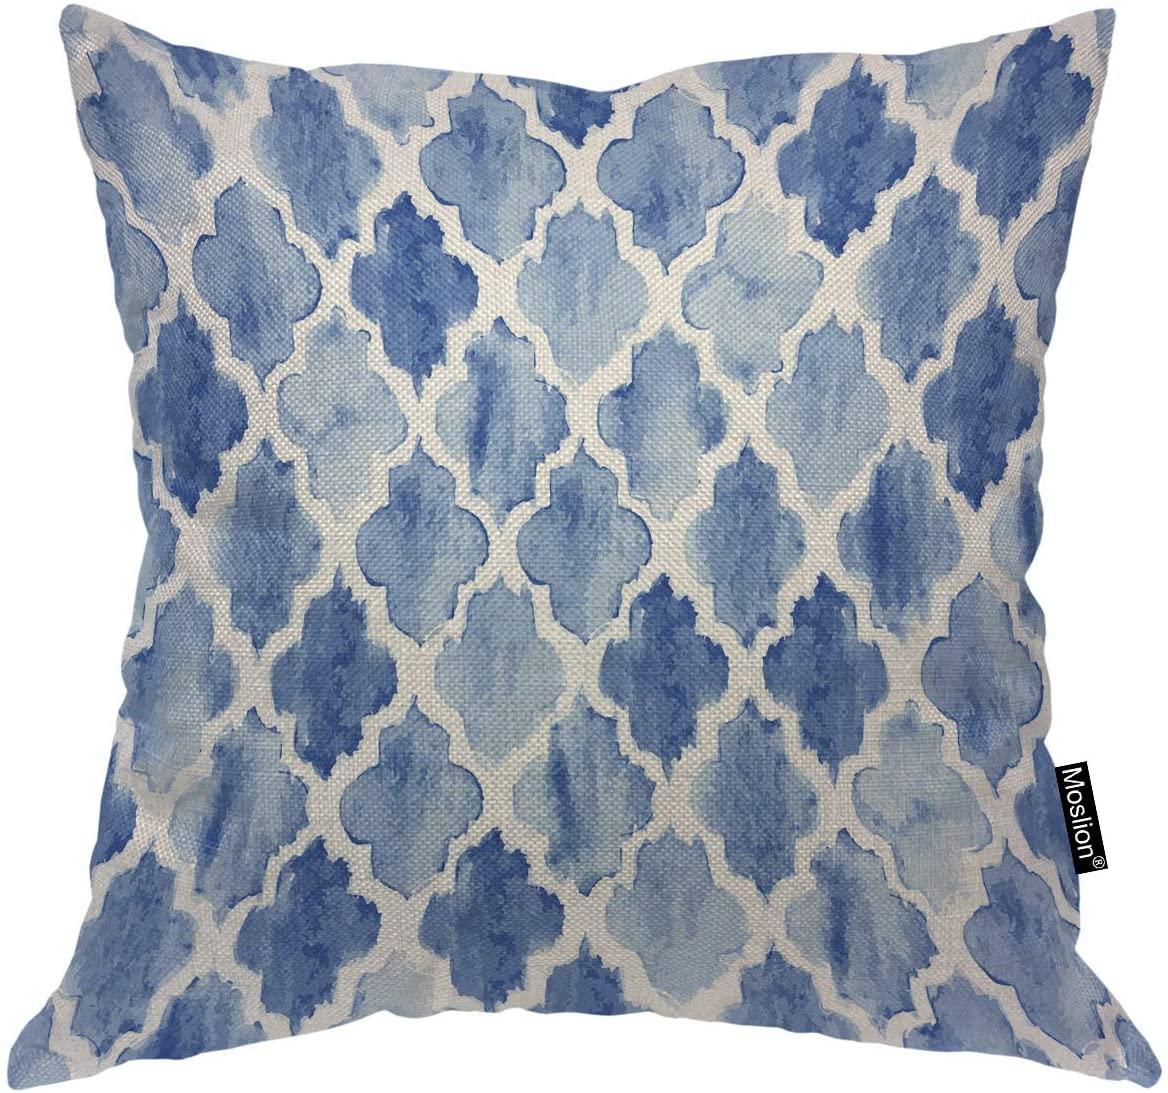 Moslion Throw Pillow Cover Moroccan Pattern Vintage Seamless Blue Geometric Modern Quatrefoil Design Square Pillow Case Cushion Cover for Home Car Decorative Cotton Linen 18x18 Inch